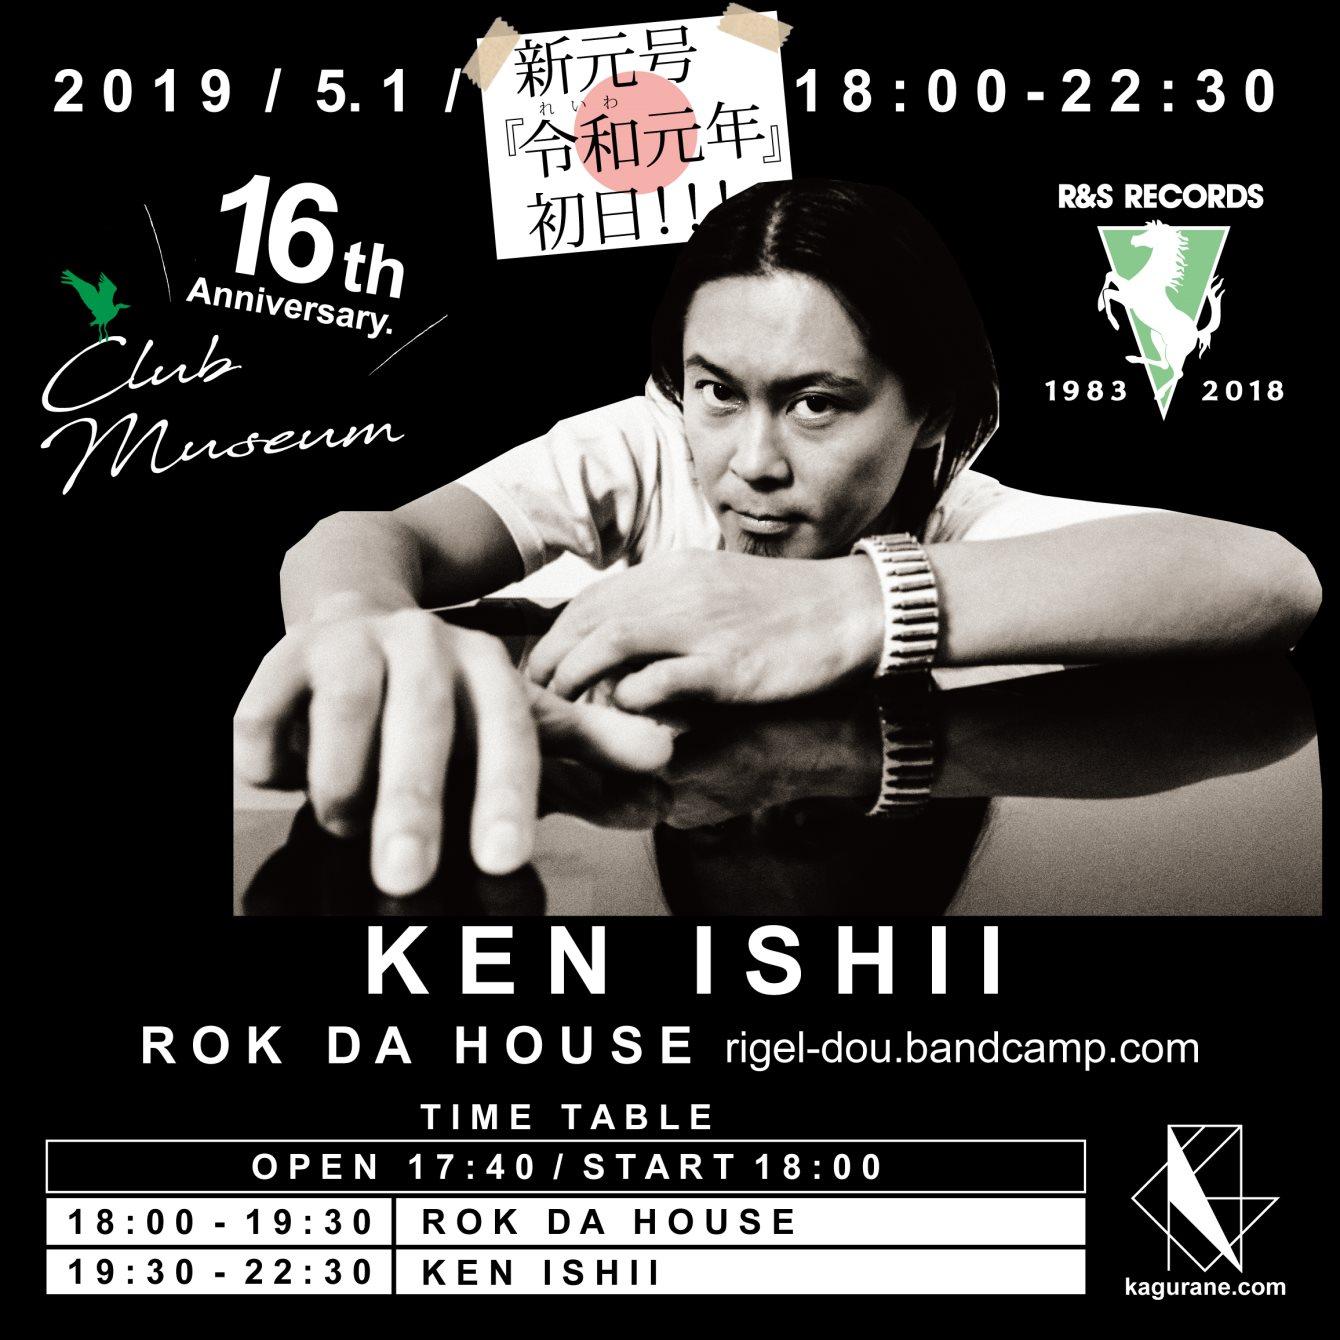 Club Museum 16th Anniv. / Ken Ishii / R&S 1983 - 2018 - Flyer back